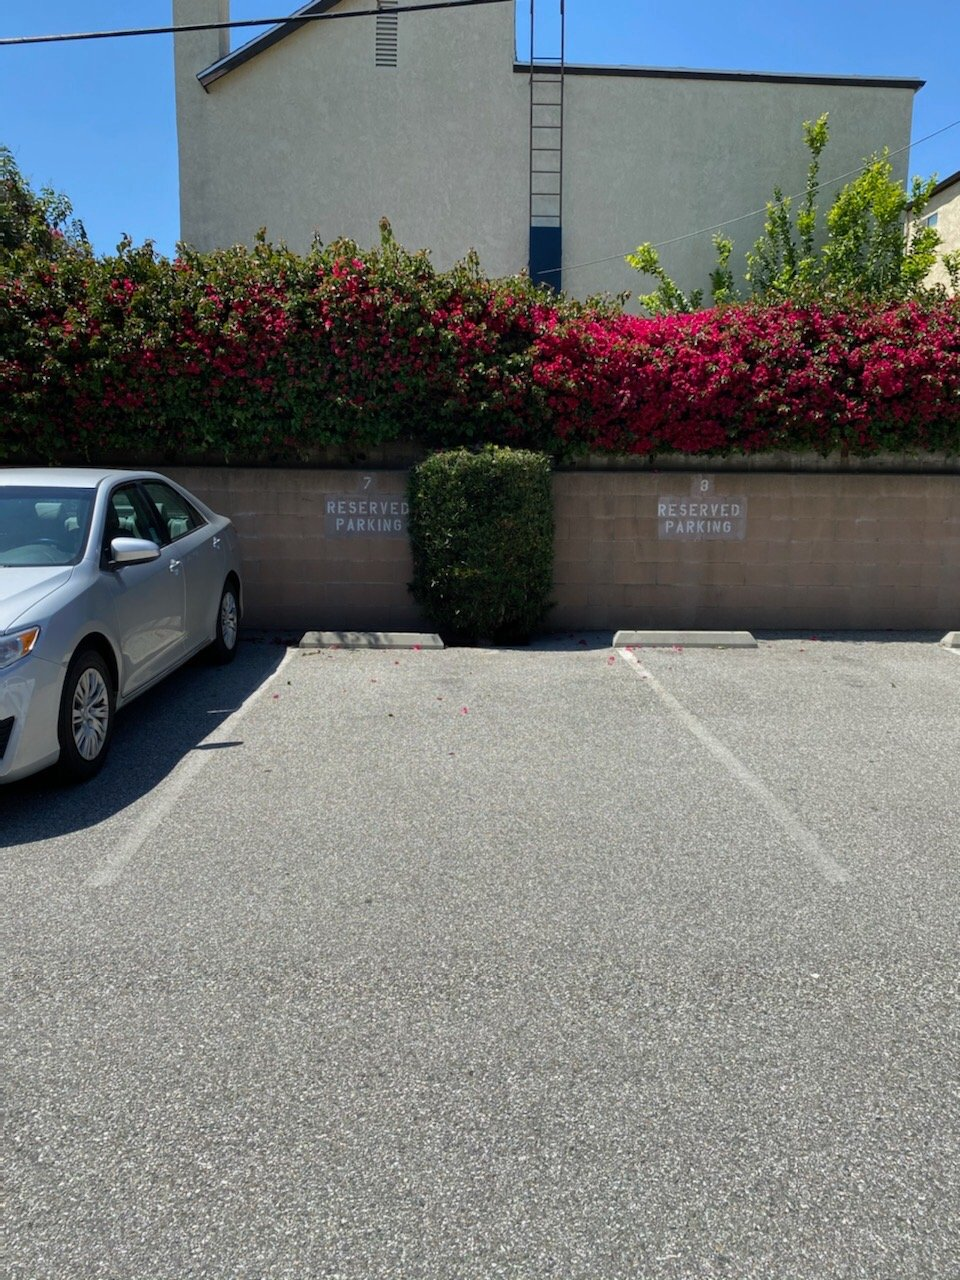 16x8 Parking Lot self storage unit